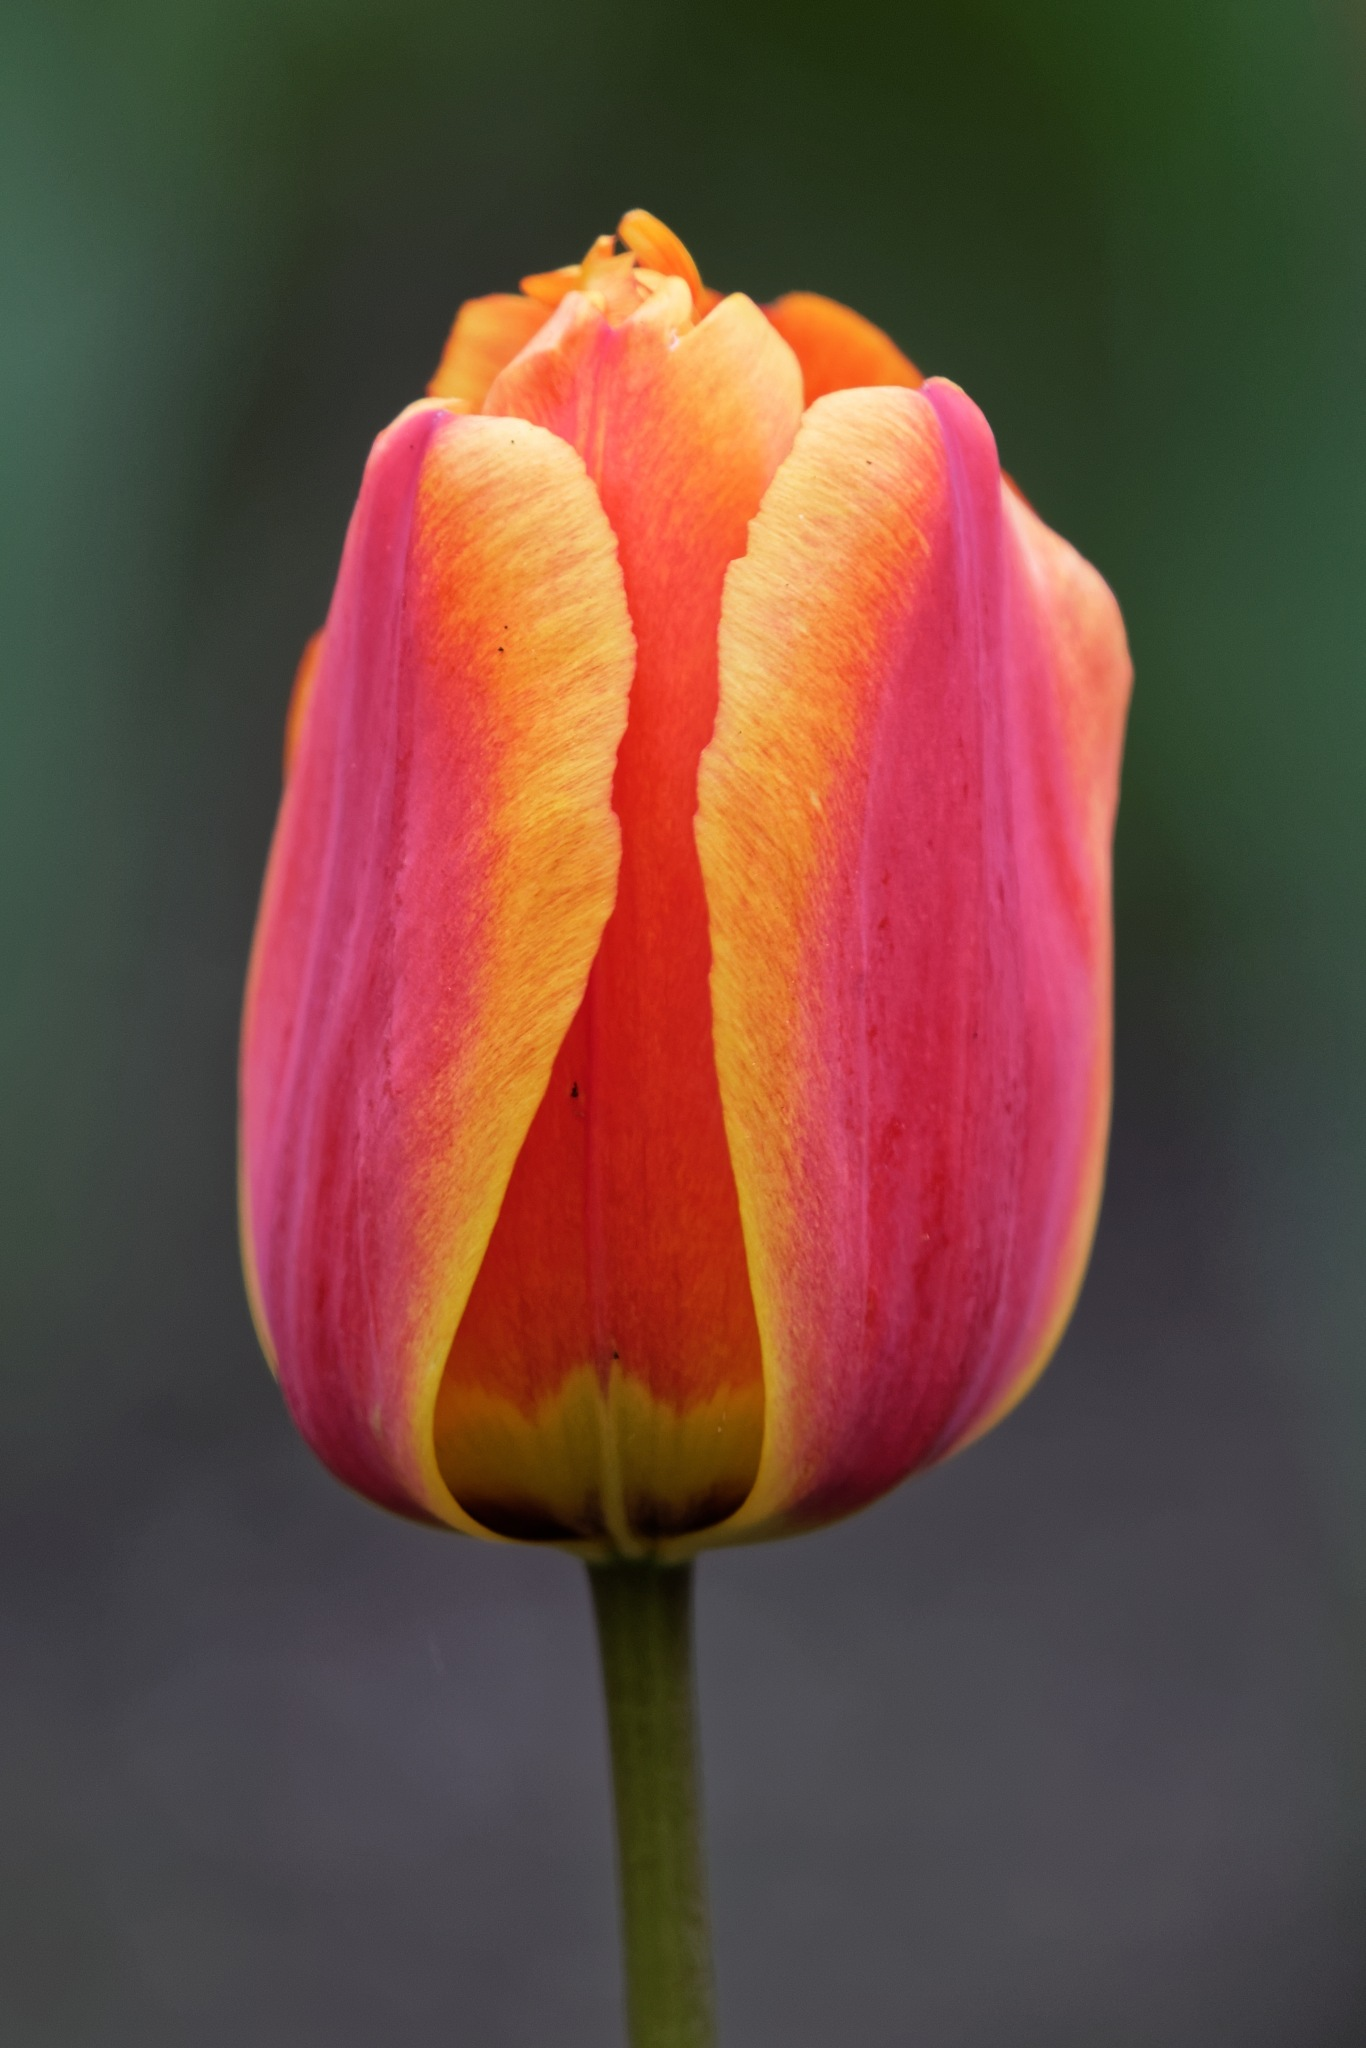 Tulip 99972 by RaphaelRaCcoon